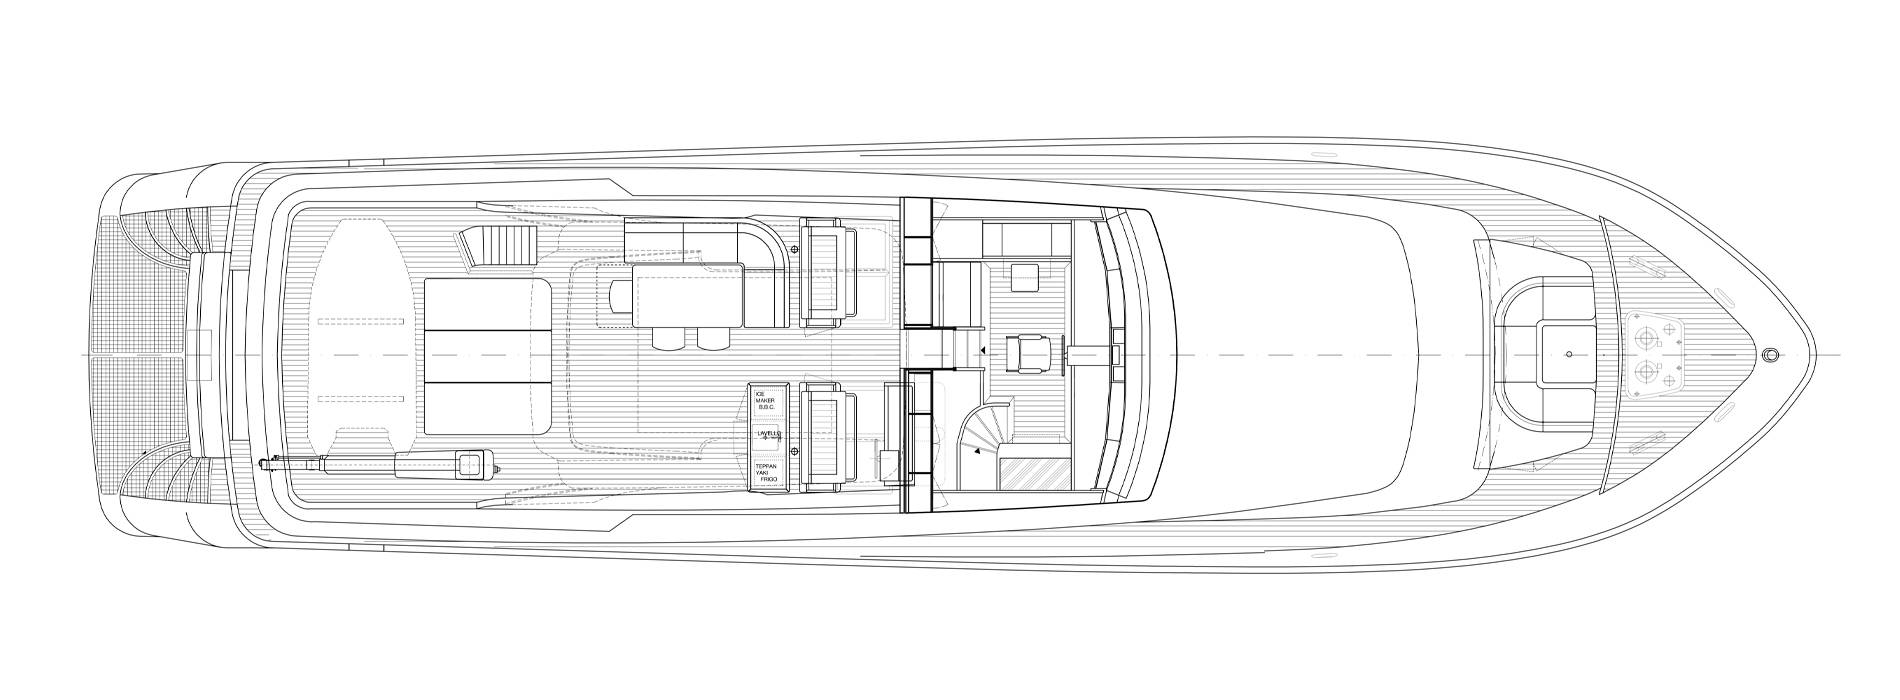 Sanlorenzo Yachts SL88-541 Флайбридж